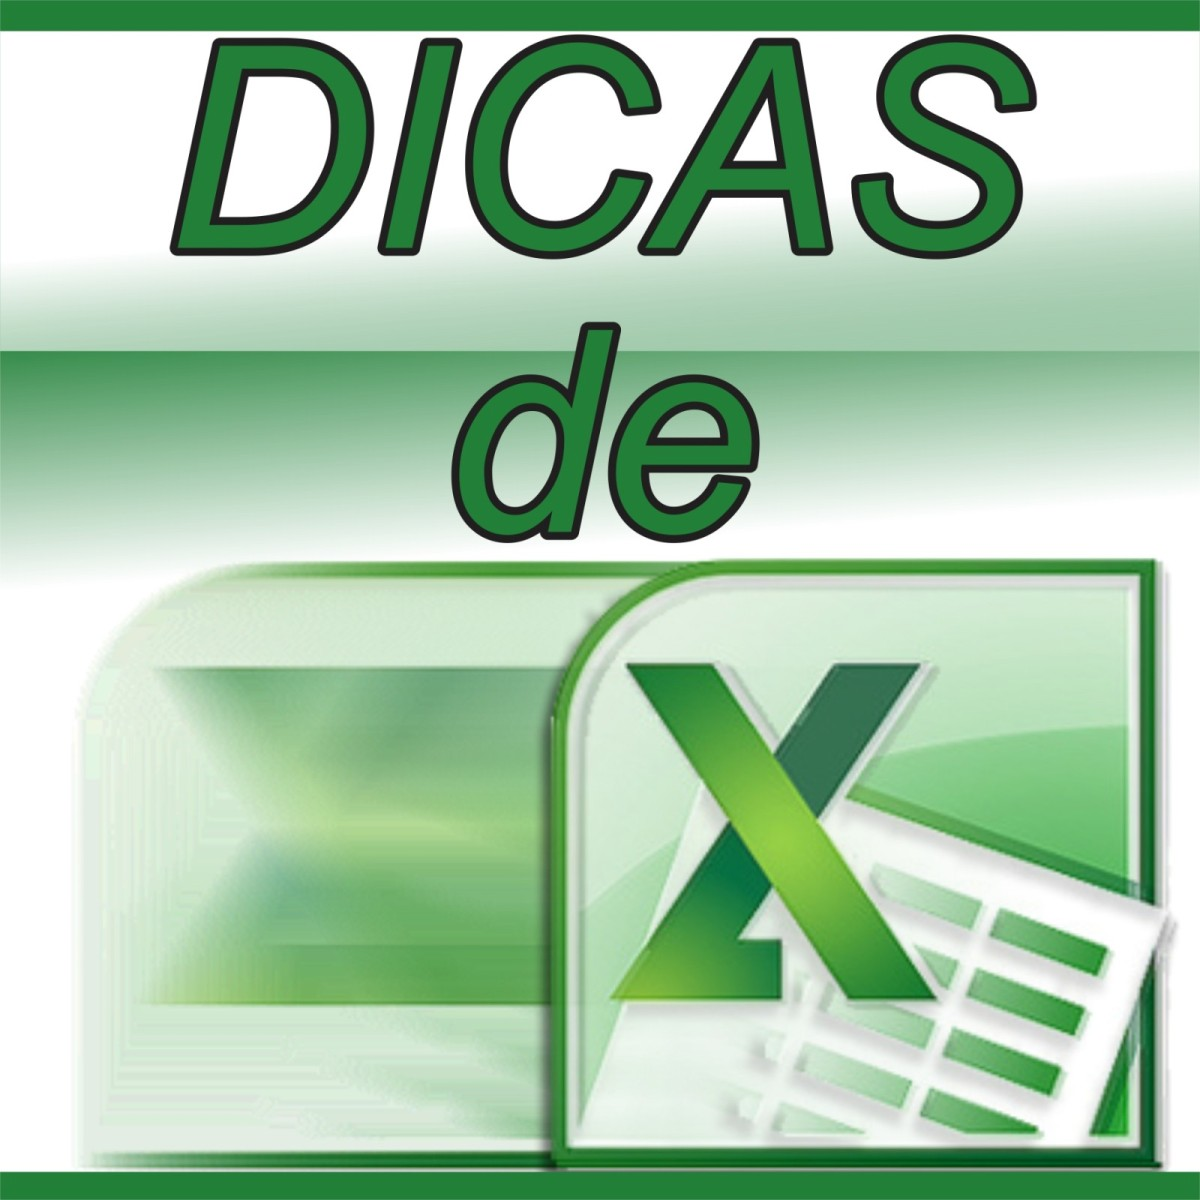 Dicas-Excel